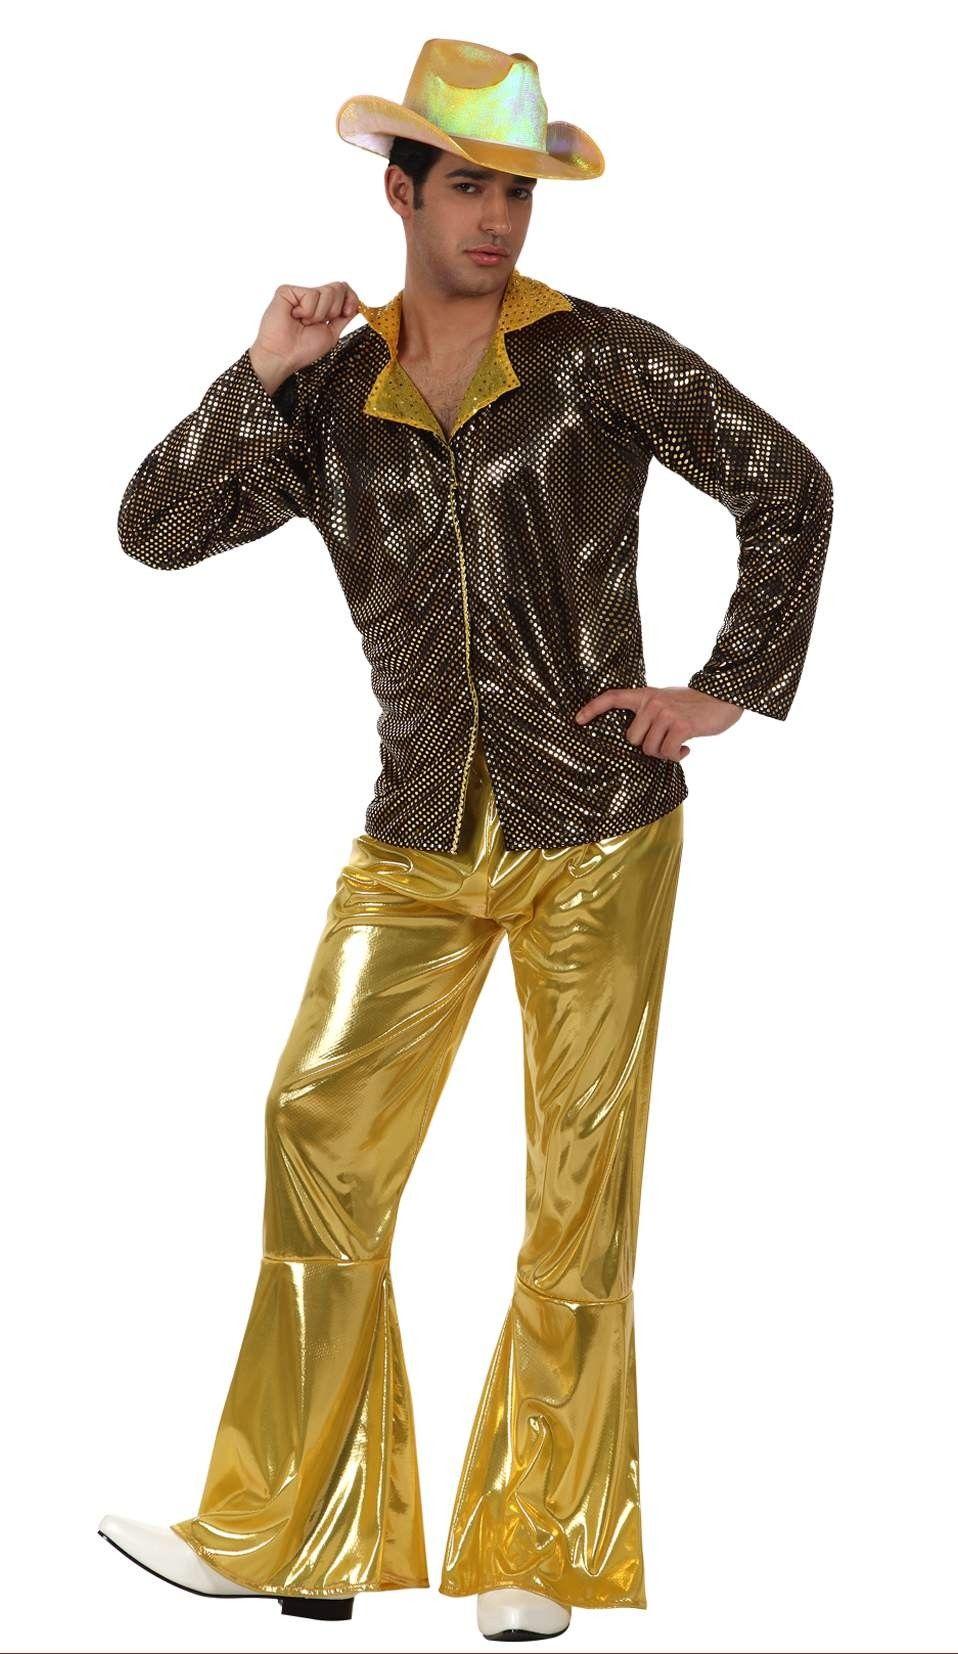 3a1083aeda Disfraz de disco dorado para hombre  Este disfraz de disco para hombre  incluye una camisa